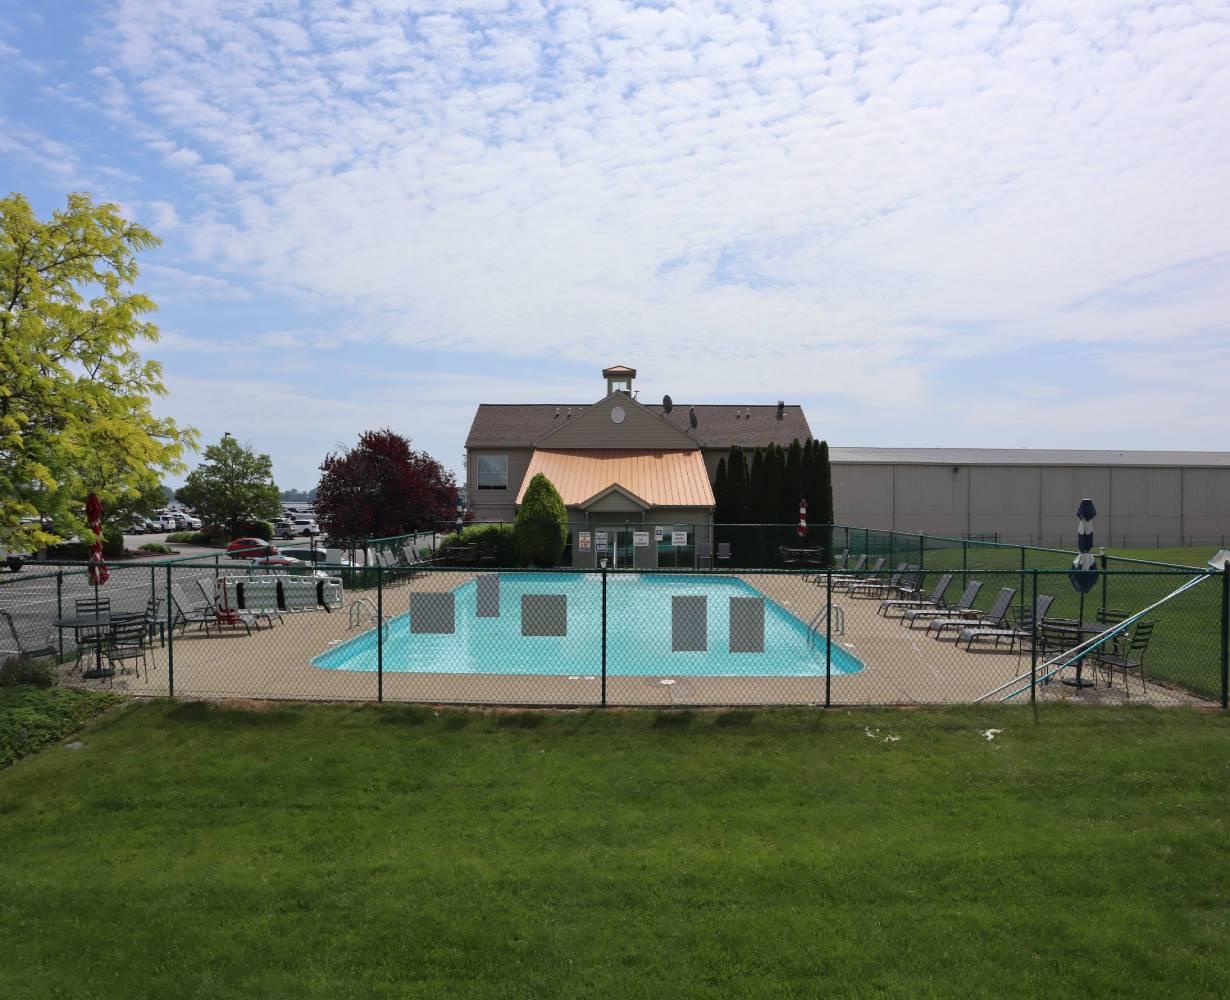 son-rise-marina-sandusky-ohio-gallery-pool-7